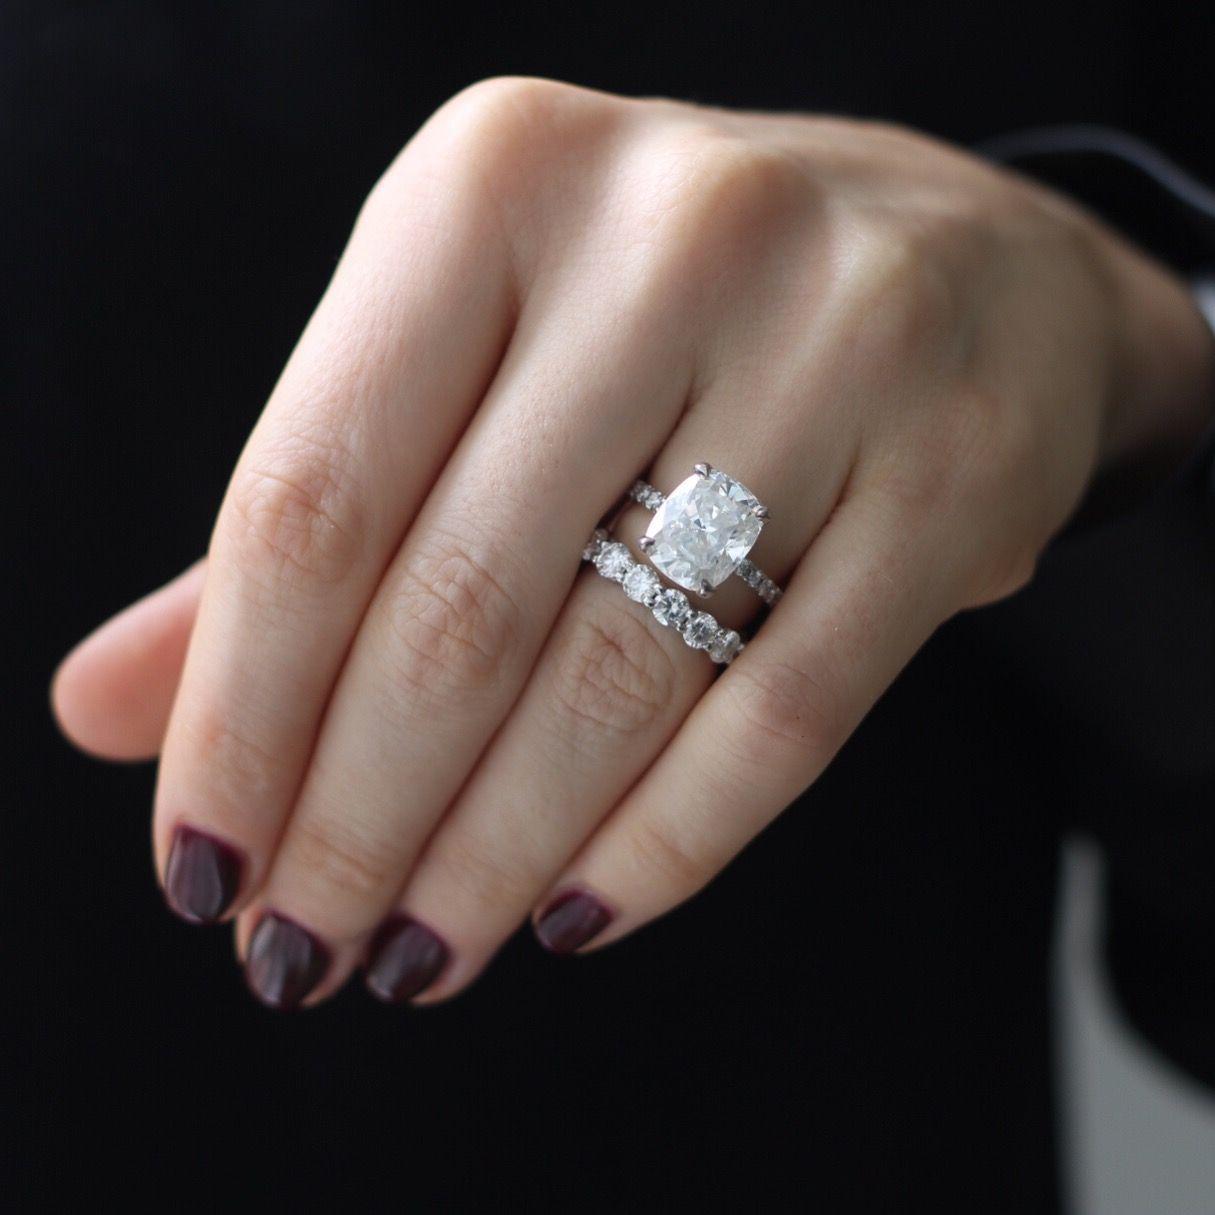 3b70f6987 Elongated Cushion Cut Harro Gem Crushed Ice Moissanite Engagement ring.  Matching moissanite eternity band 3.5